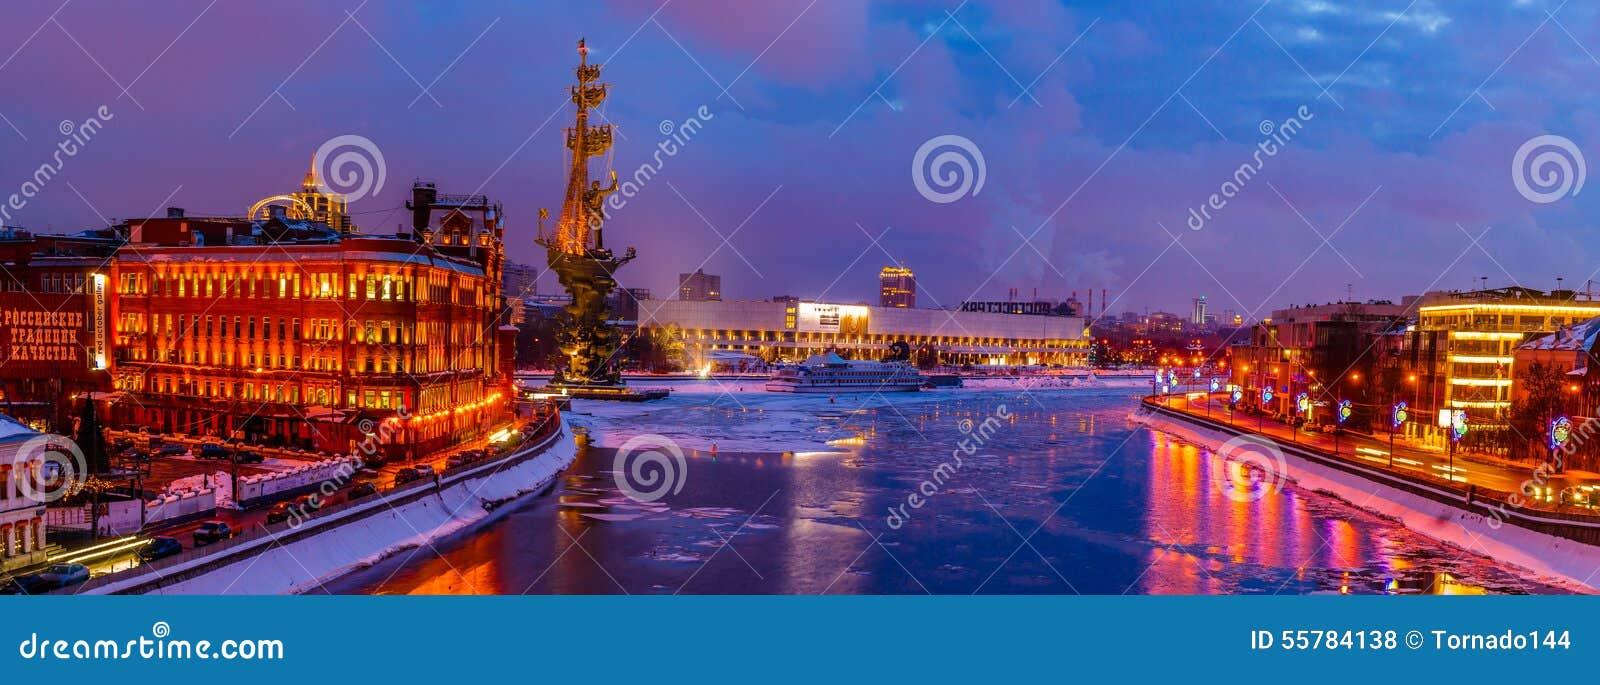 Panorama do rio de Moscou no inverno